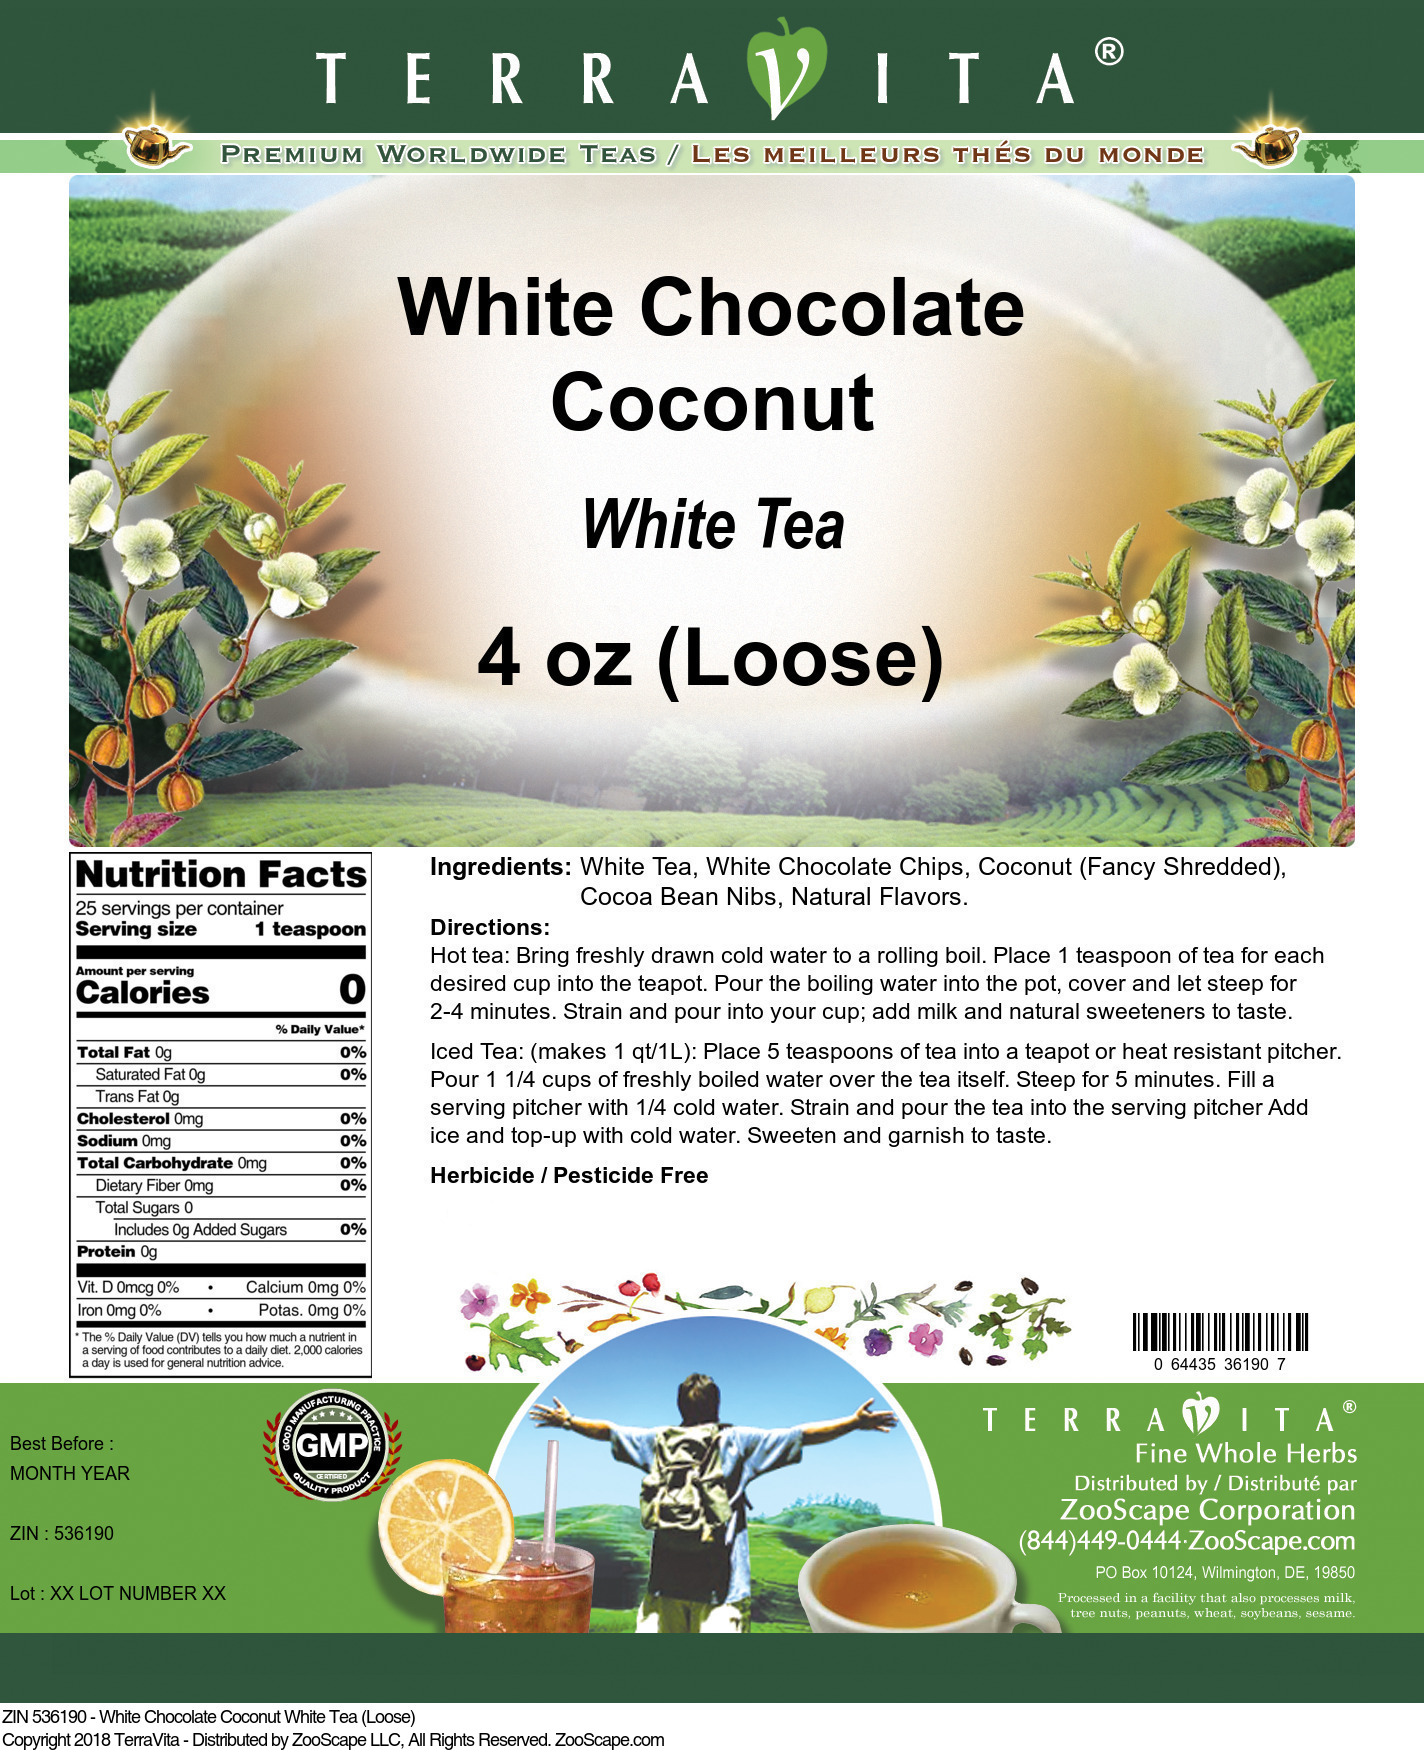 White Chocolate Coconut White Tea